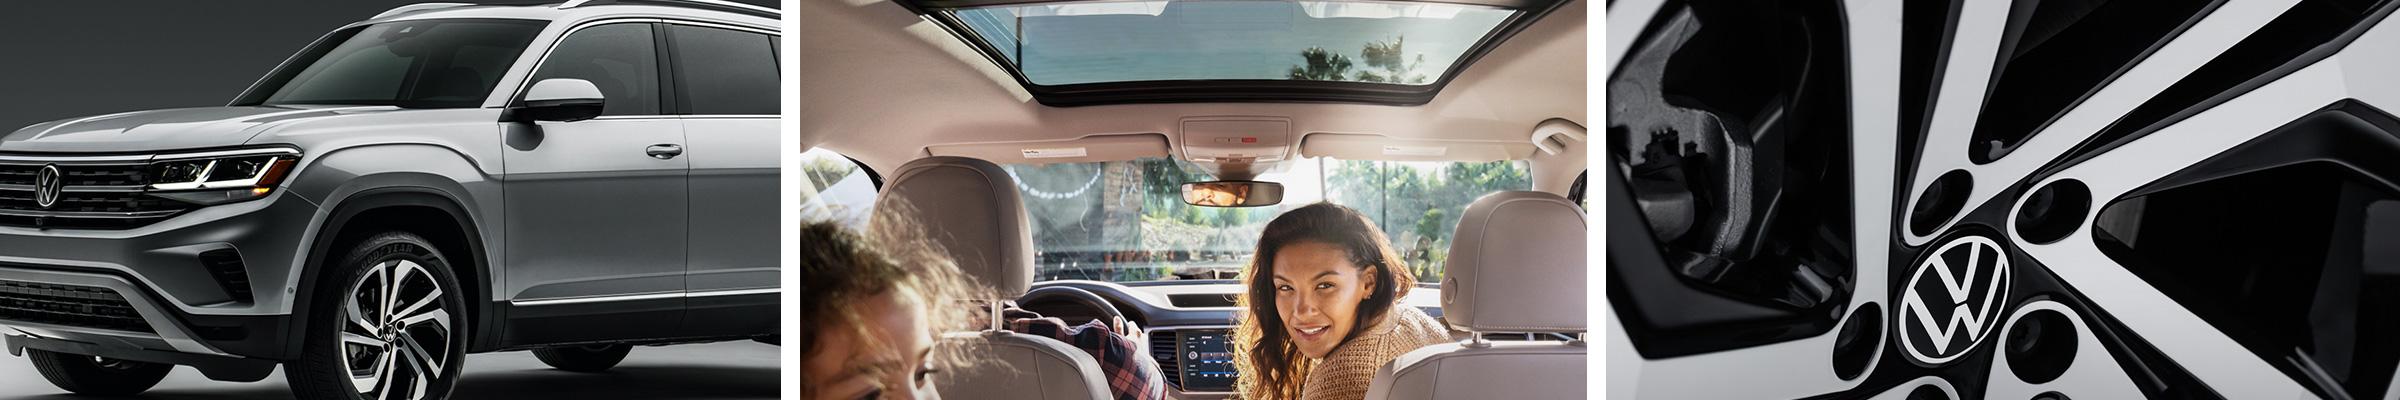 2021 Volkswagen Atlas For Sale West Palm Beach FL | Wellington